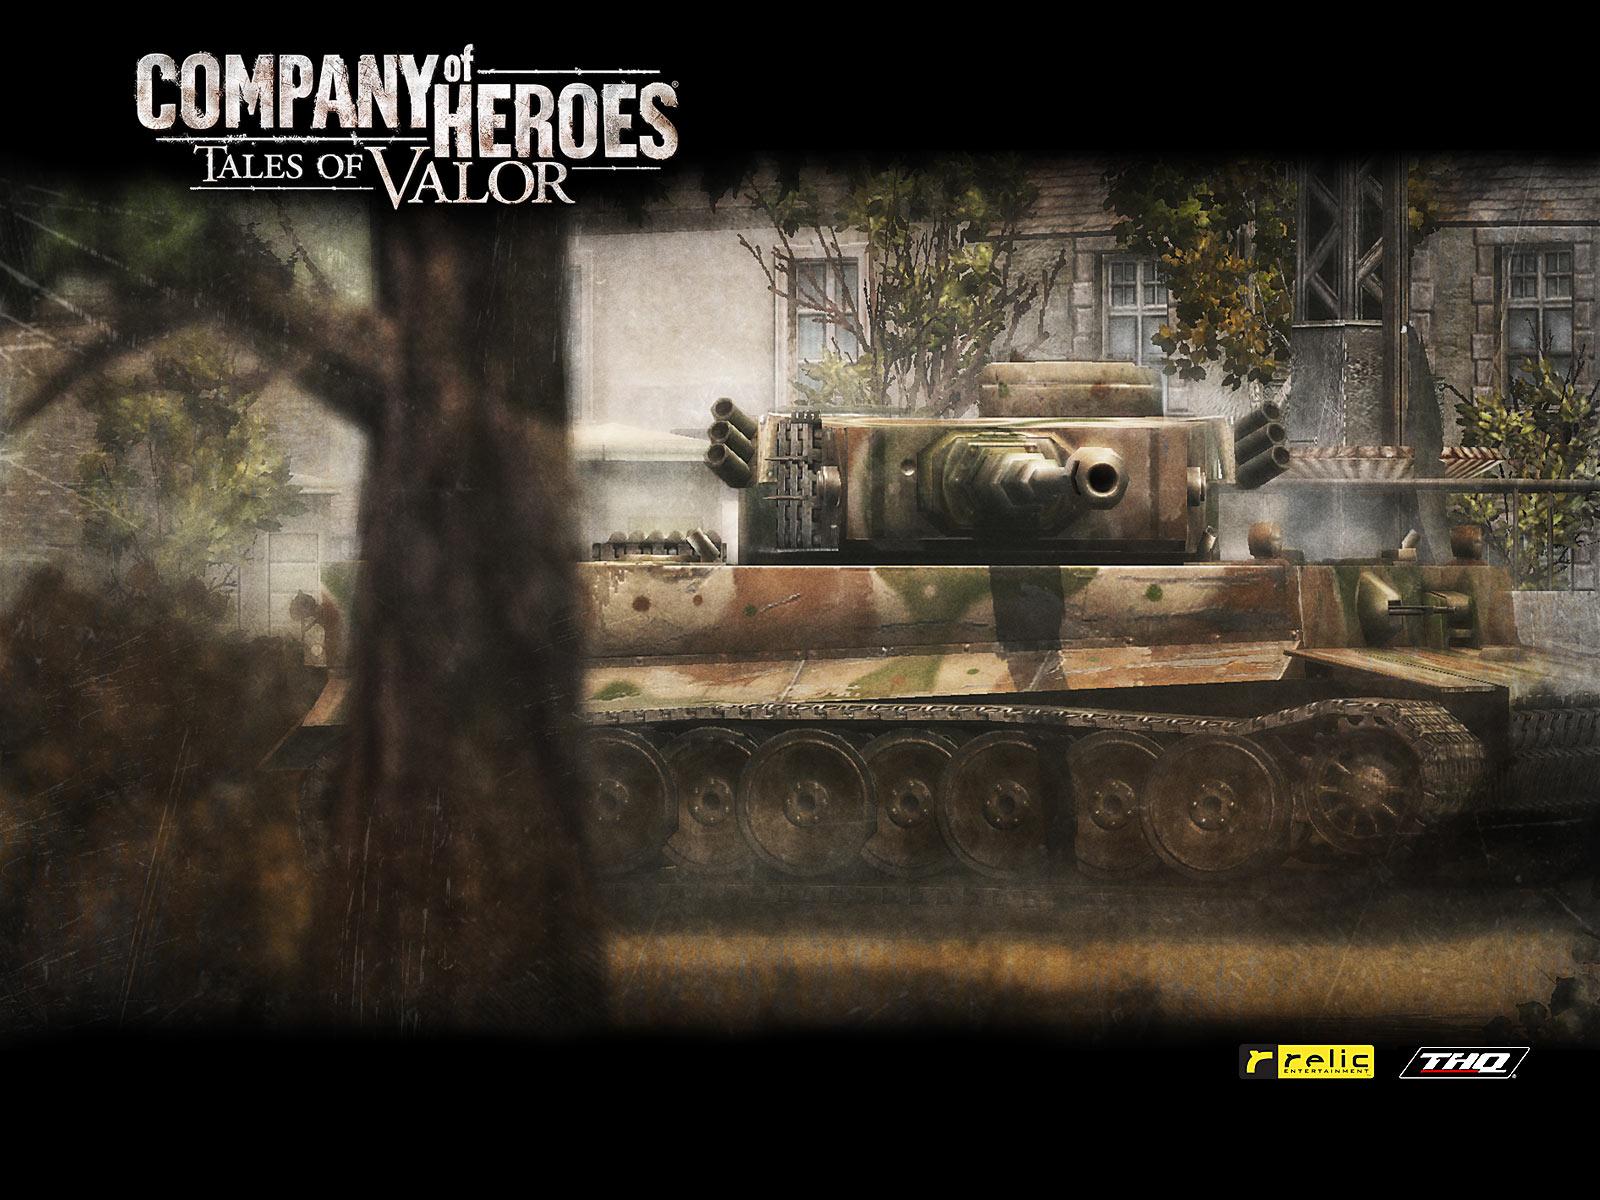 Кряк для Company of Heroes - Tales of Valor v. 2,500. Multi-Platform